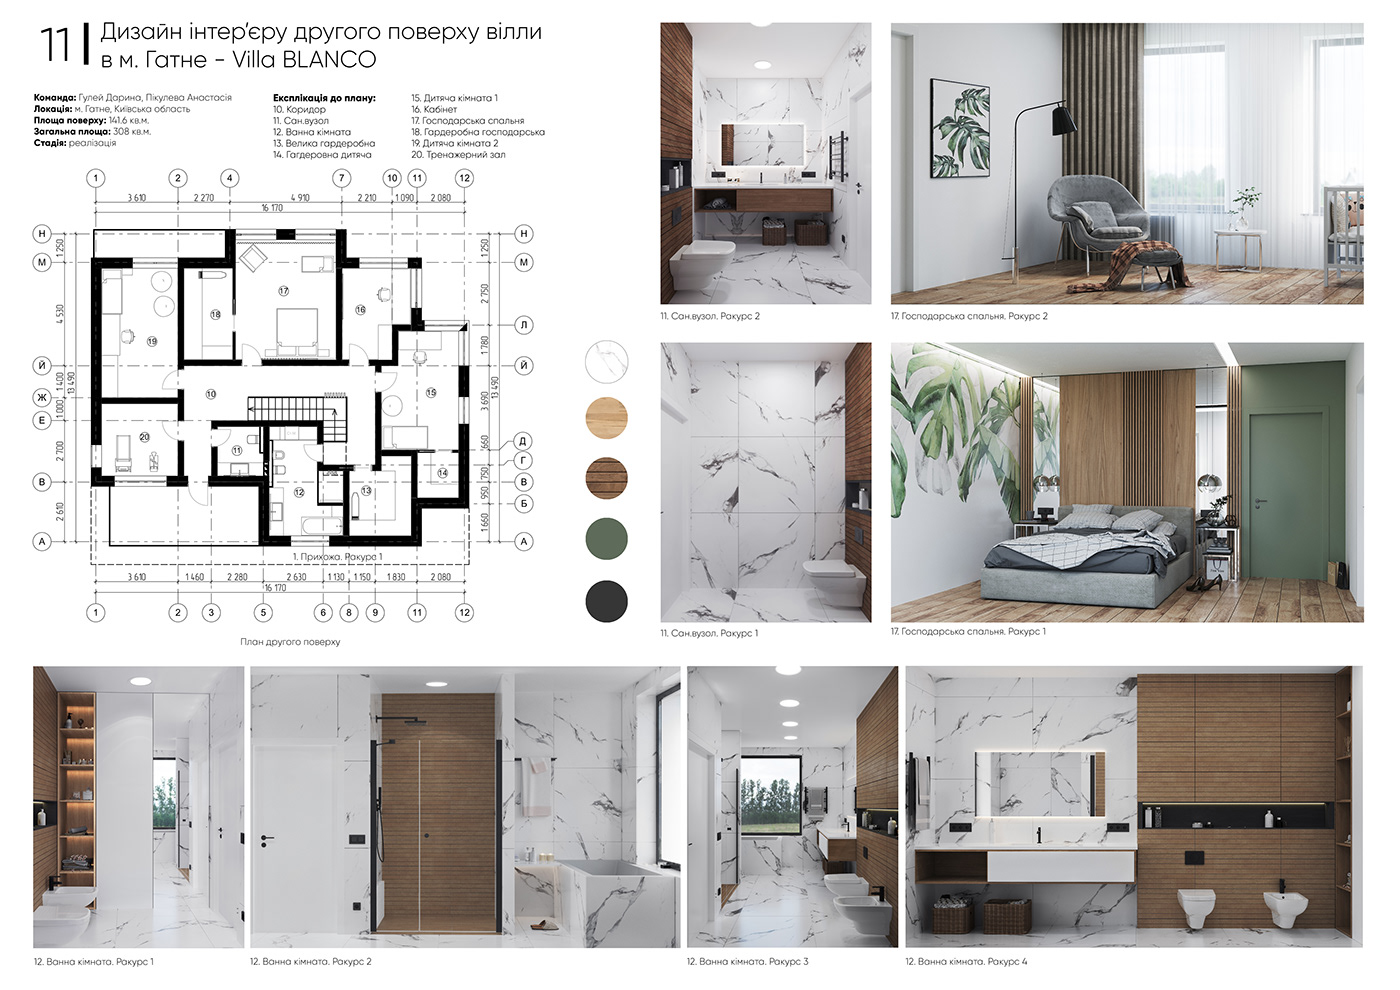 3dmax ArchiCAD architect architecture designer interiordesign Interiro photoshop revit Villa